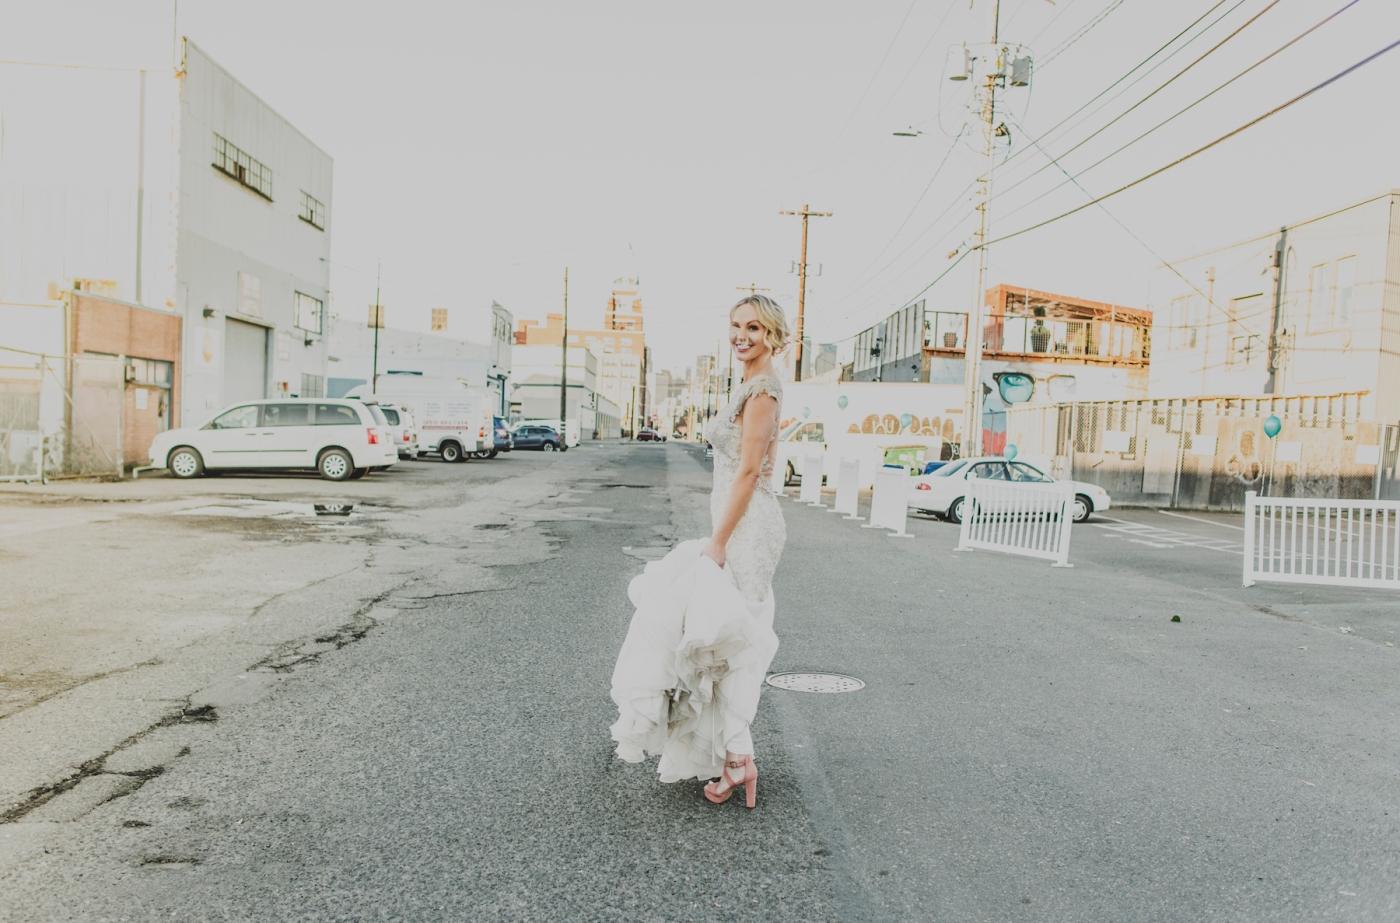 photography_by_jane_speleers_2017_wedding_show_i_do_sodo_within_designed_by_melody_davisdsc_0817